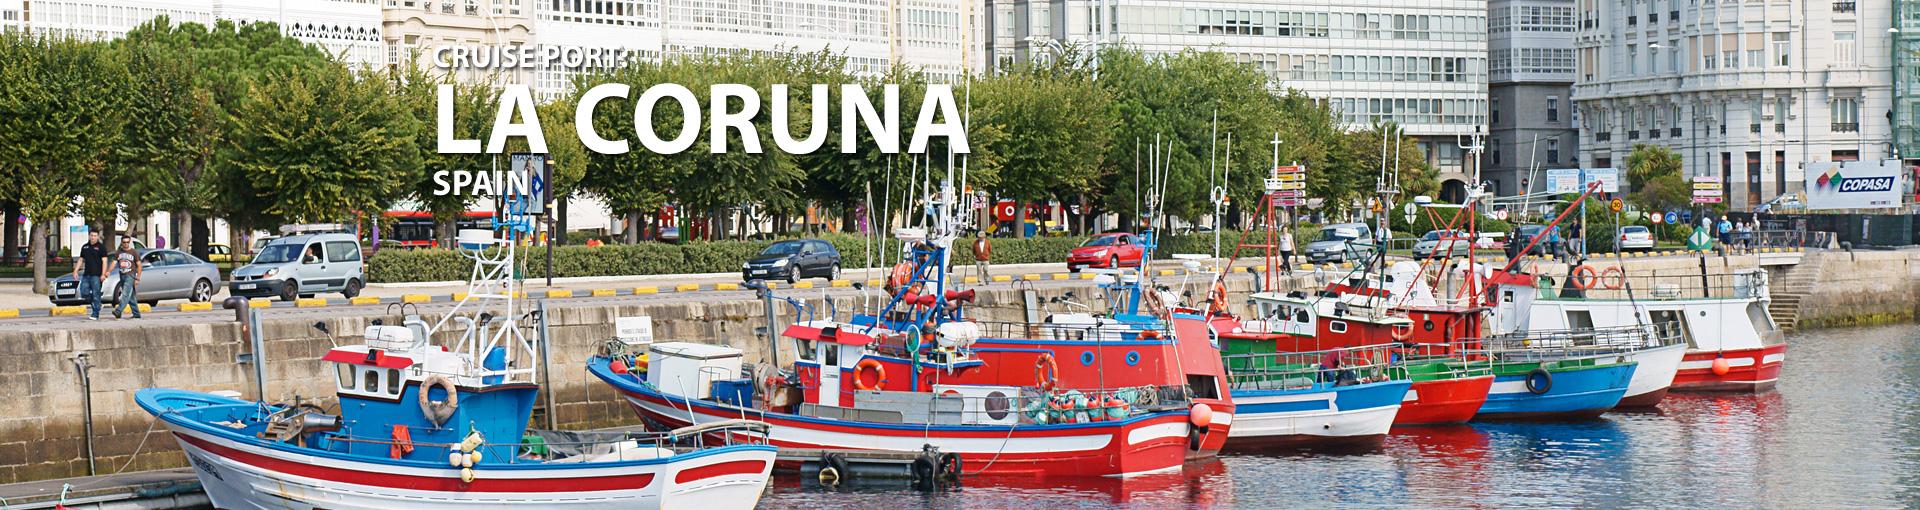 Cruises to La Coruna, Spain